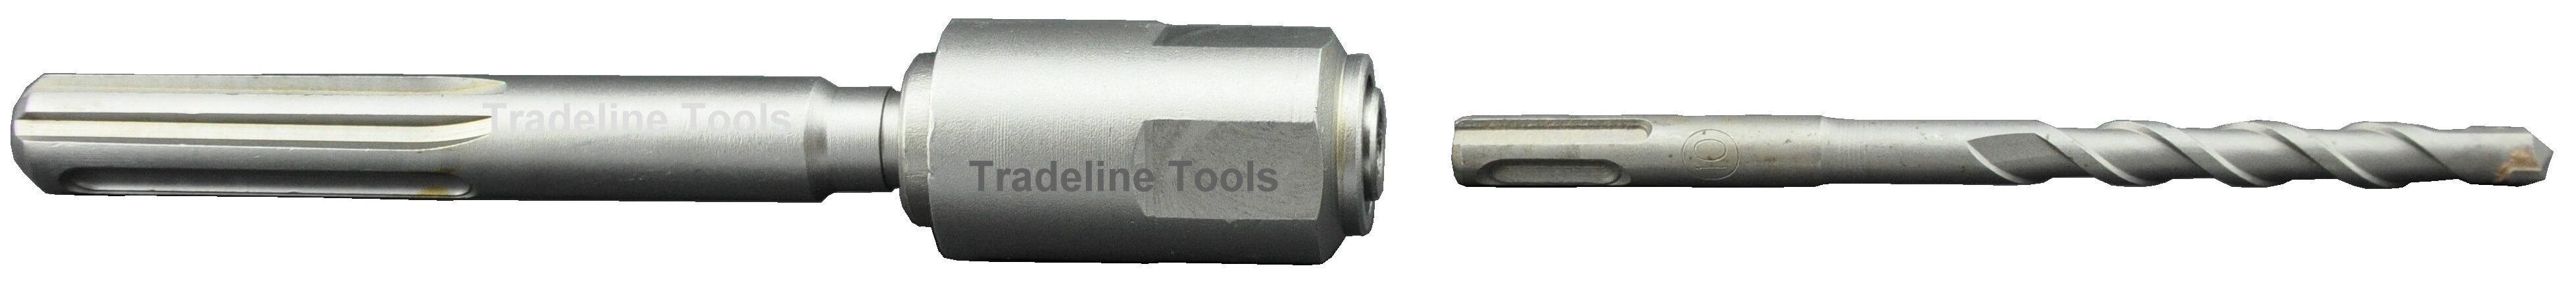 Augerton SDS MAX to SDS PLUS Adaptor